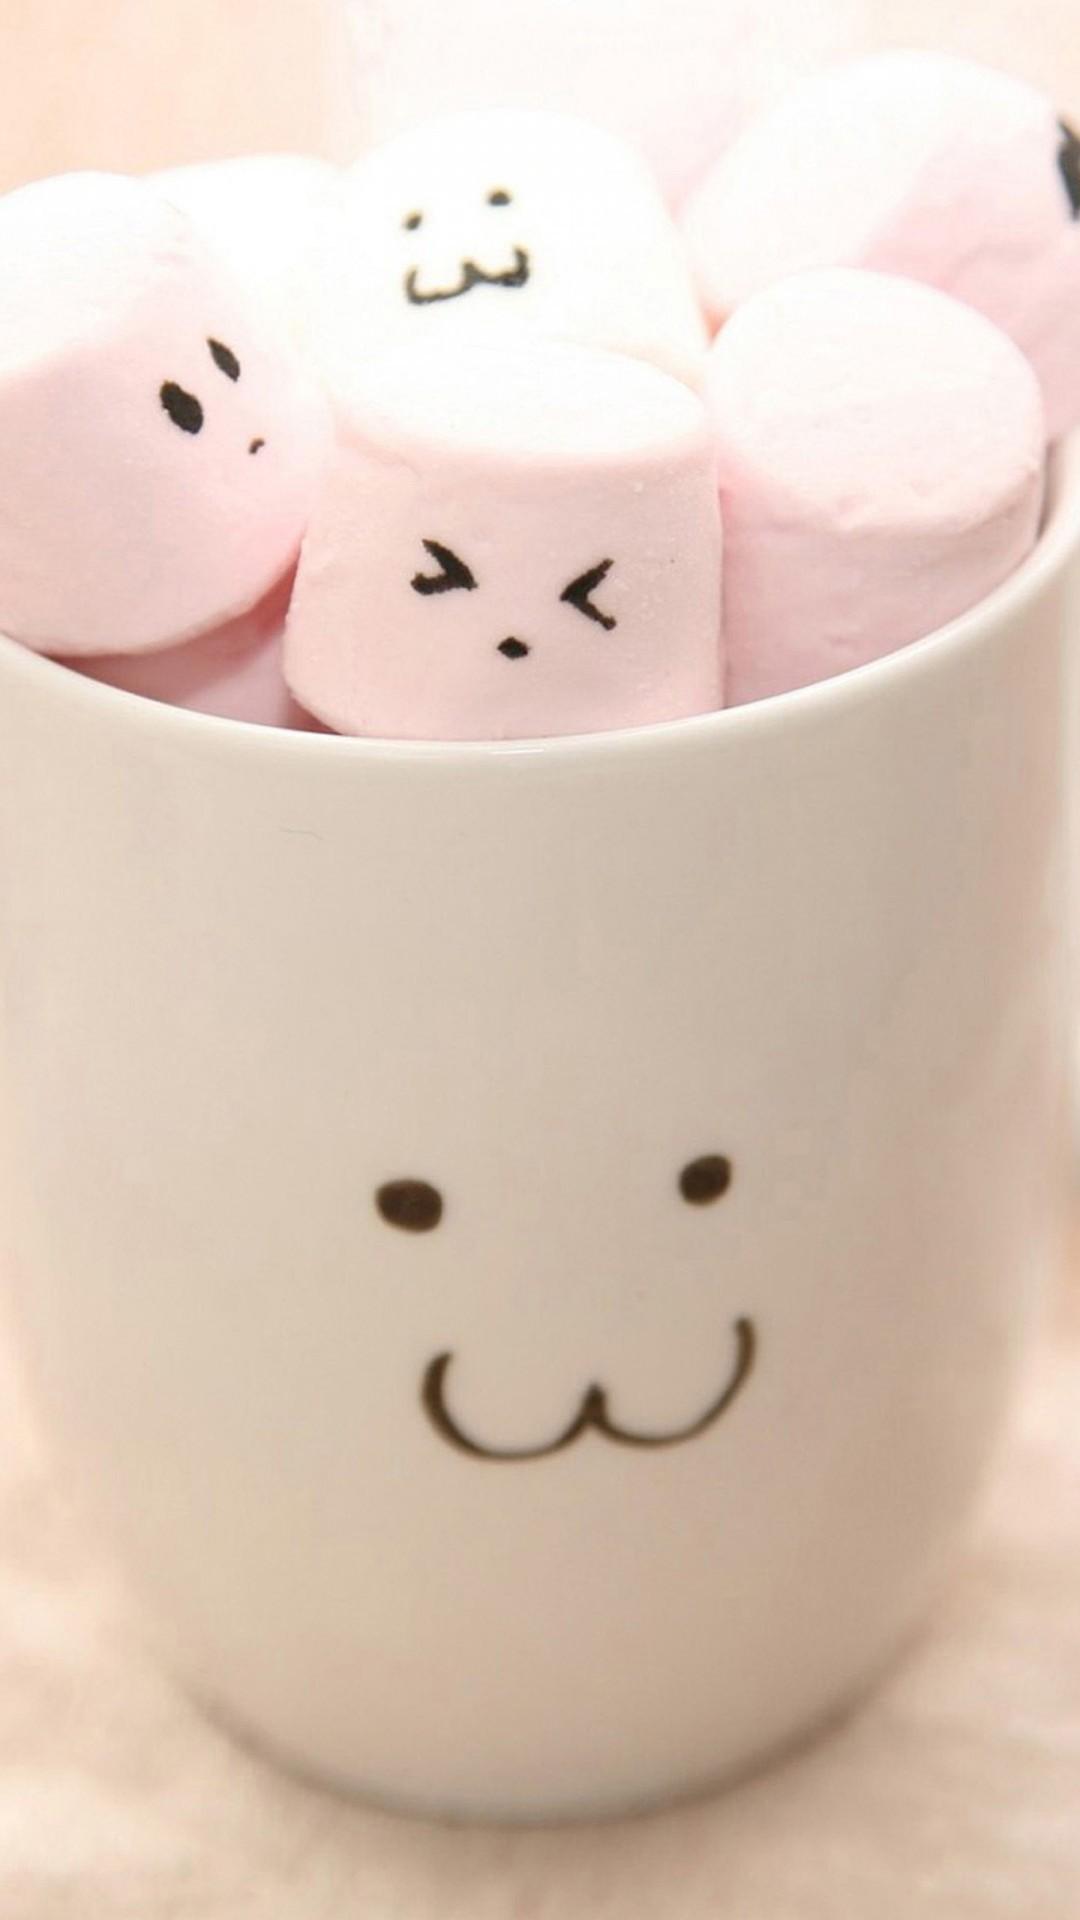 Cute Marshmallow Iphone Wallpaper